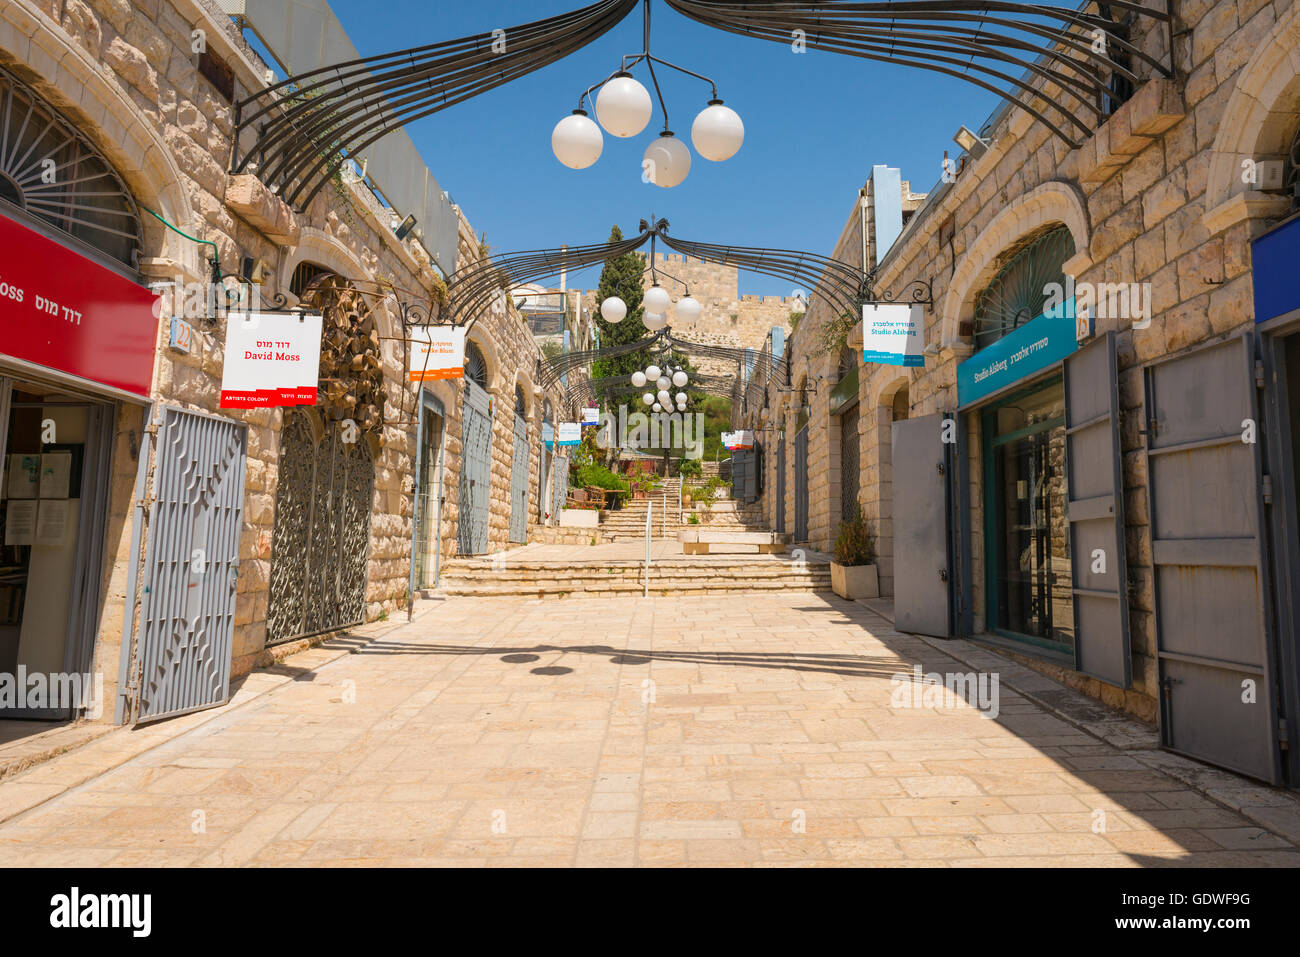 Israel Jerusalem Modern City Artists Colony street - James Felt Lane - galleries studios & workshops of artists - Stock Image